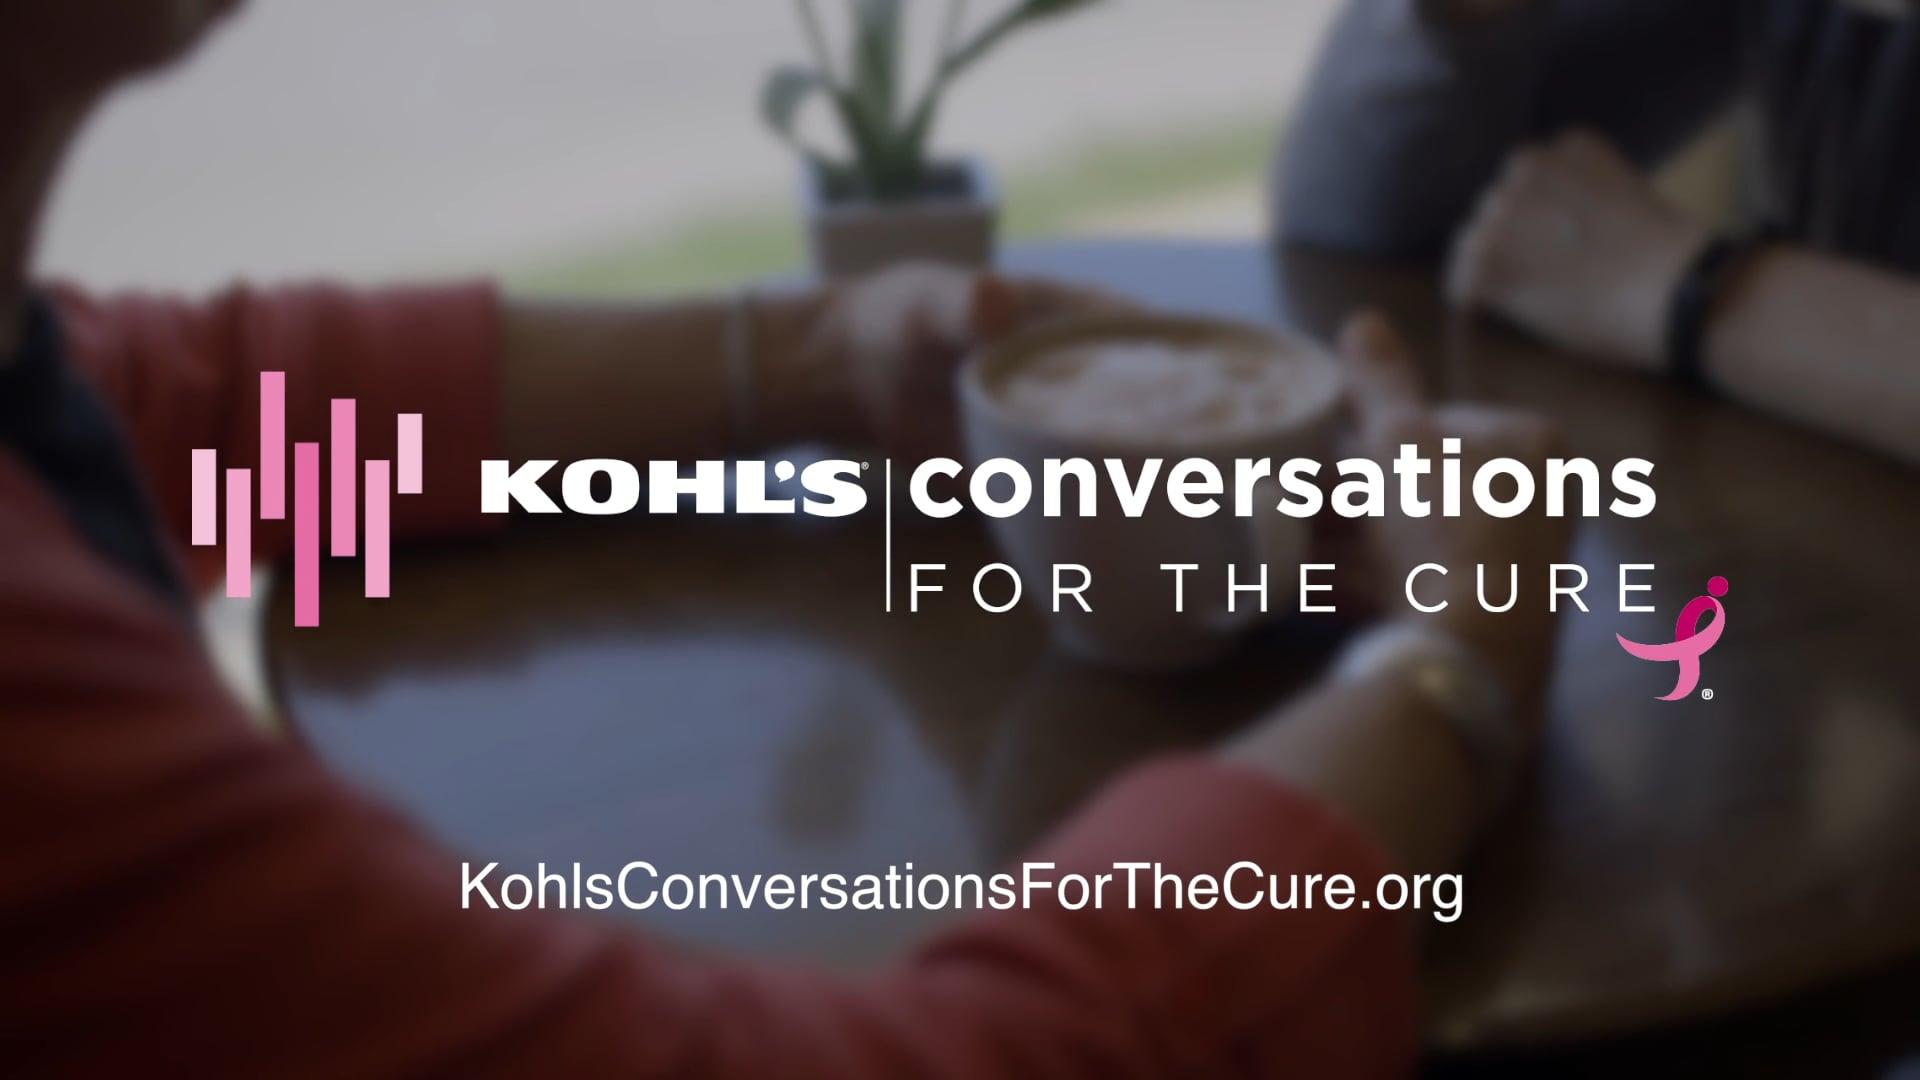 Susan G. Komen Conversation